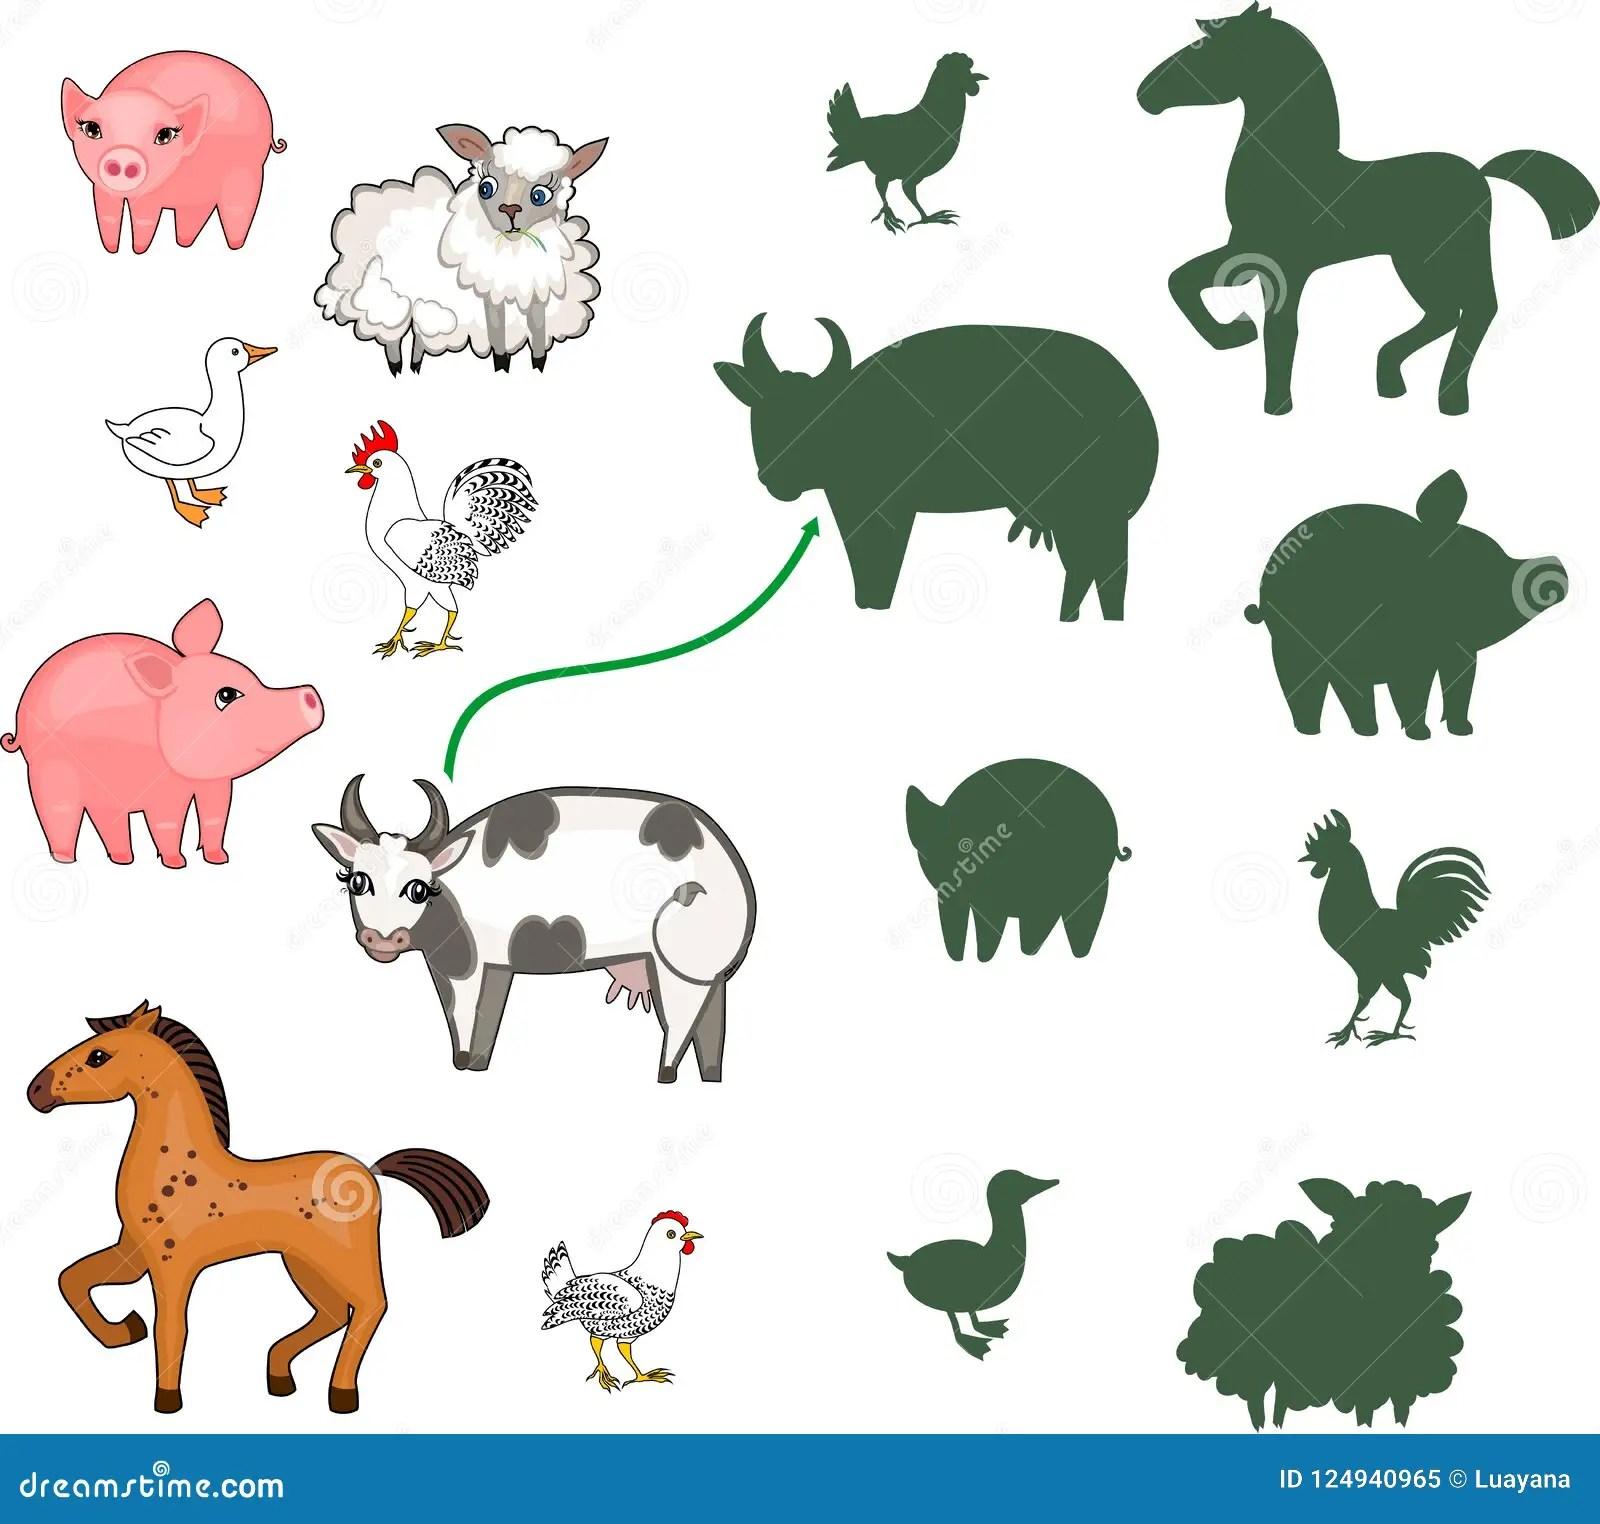 Farm Animals Matching Worksheet For Preschool